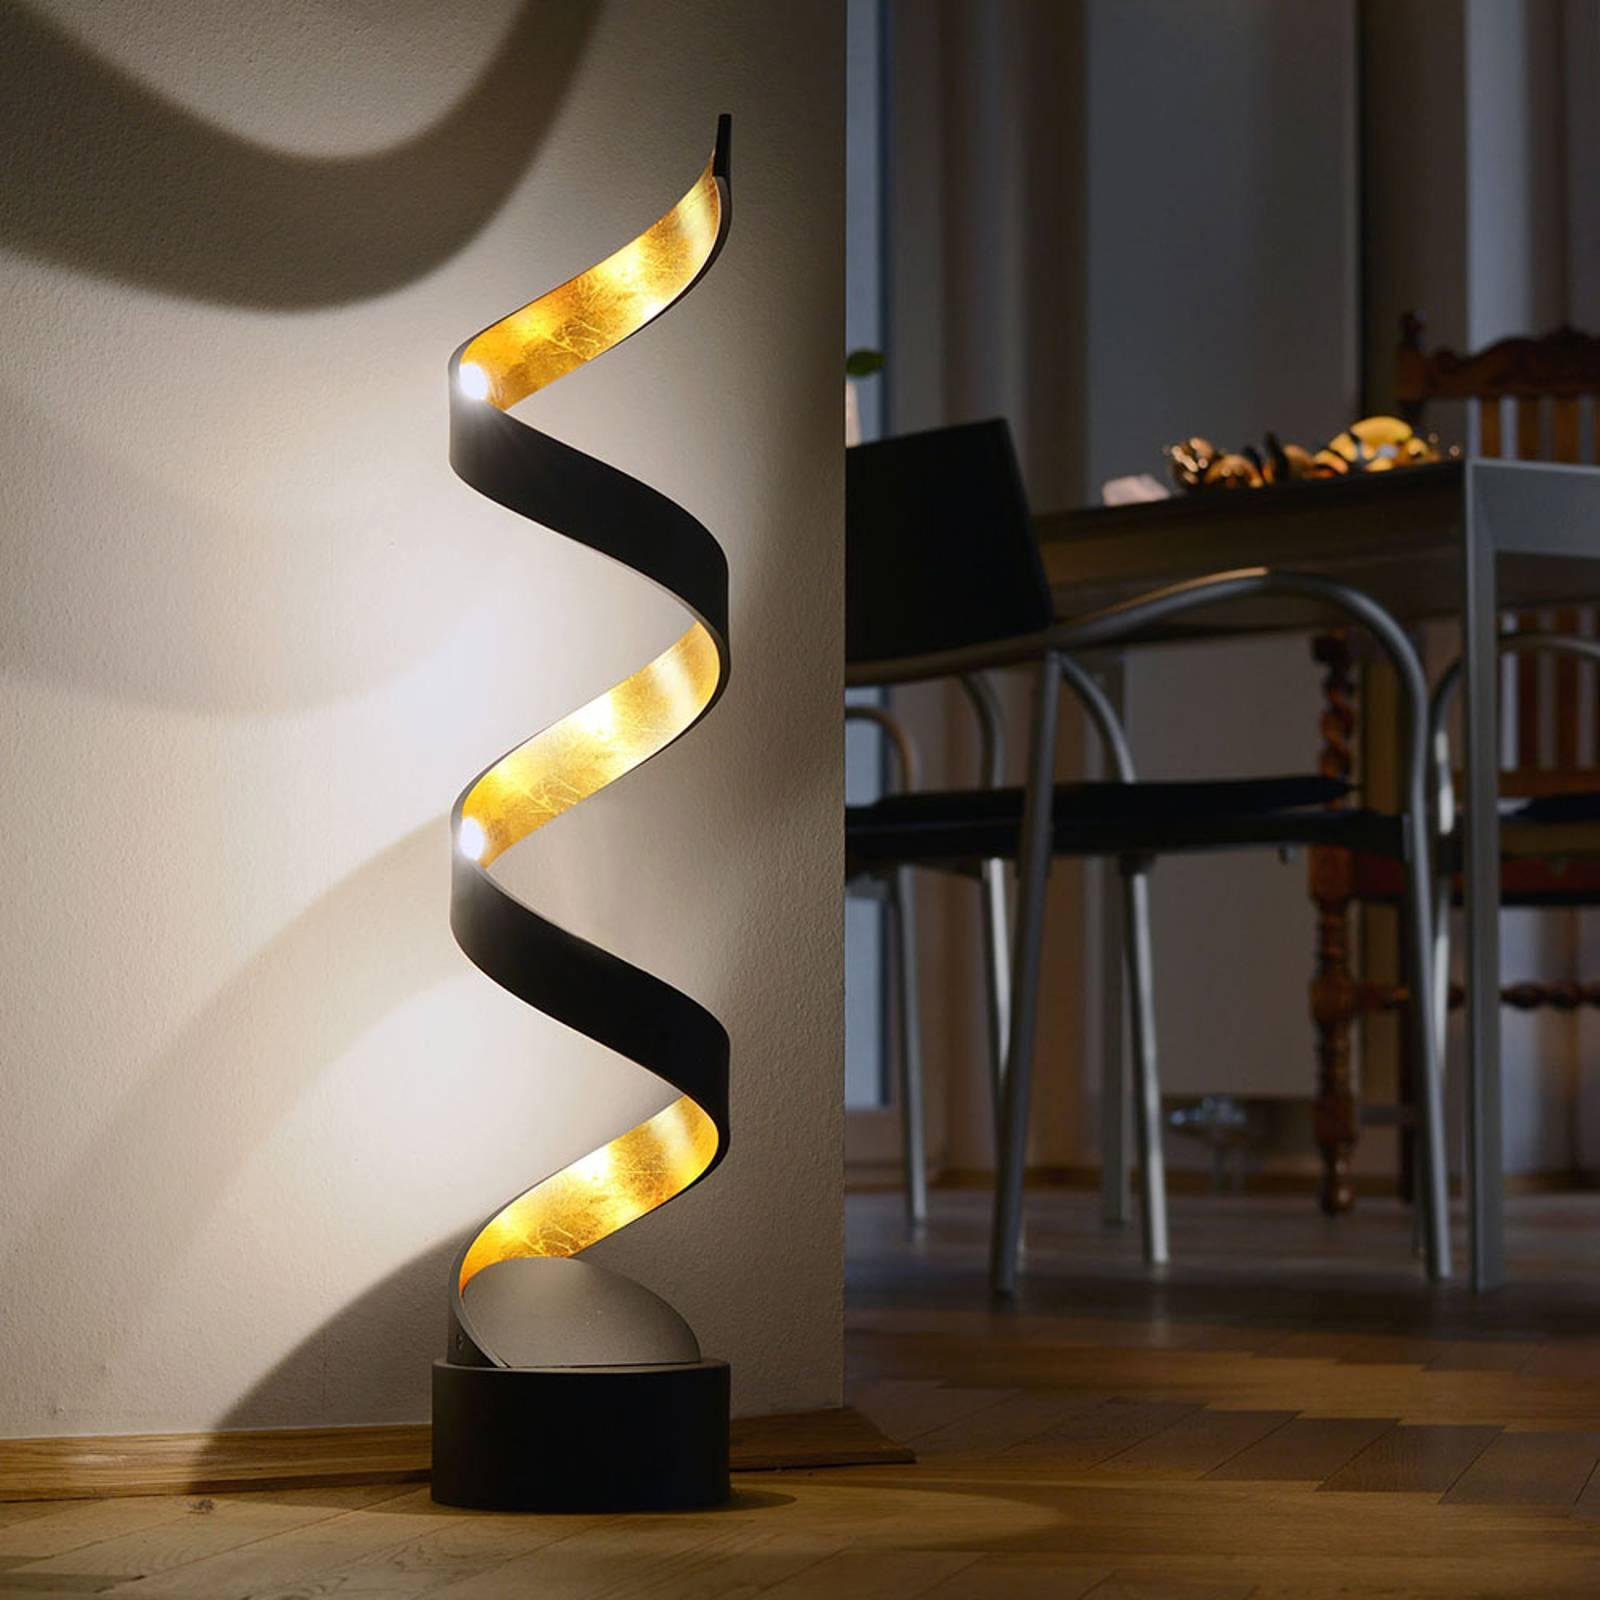 LED tafellamp Helix, hoogte 66 cm, zwart-goud